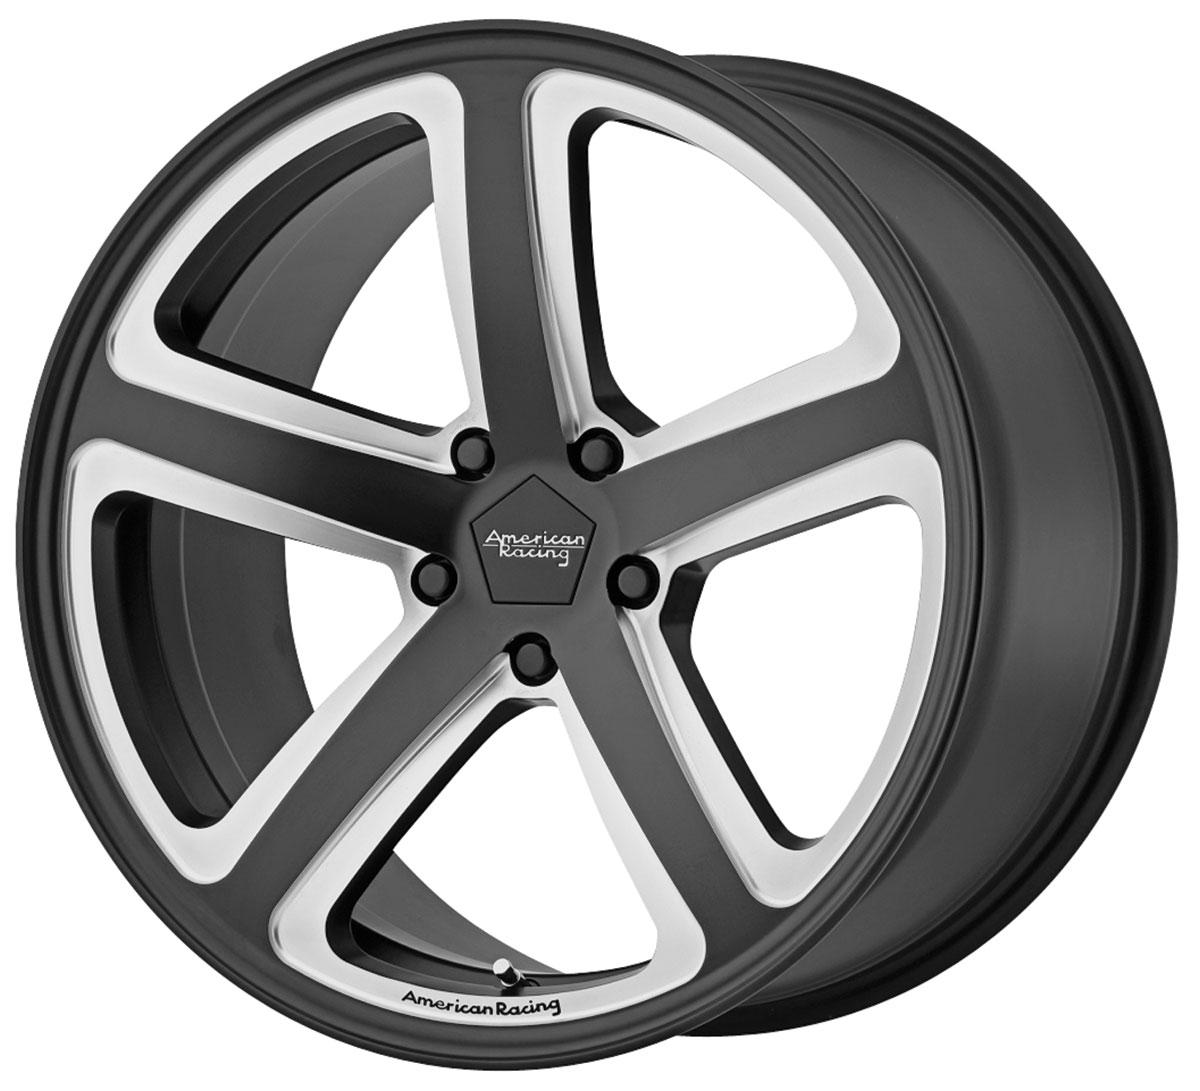 Wheel, American Racing, AR922 Hot Lap, 2019 CAD, 20x9